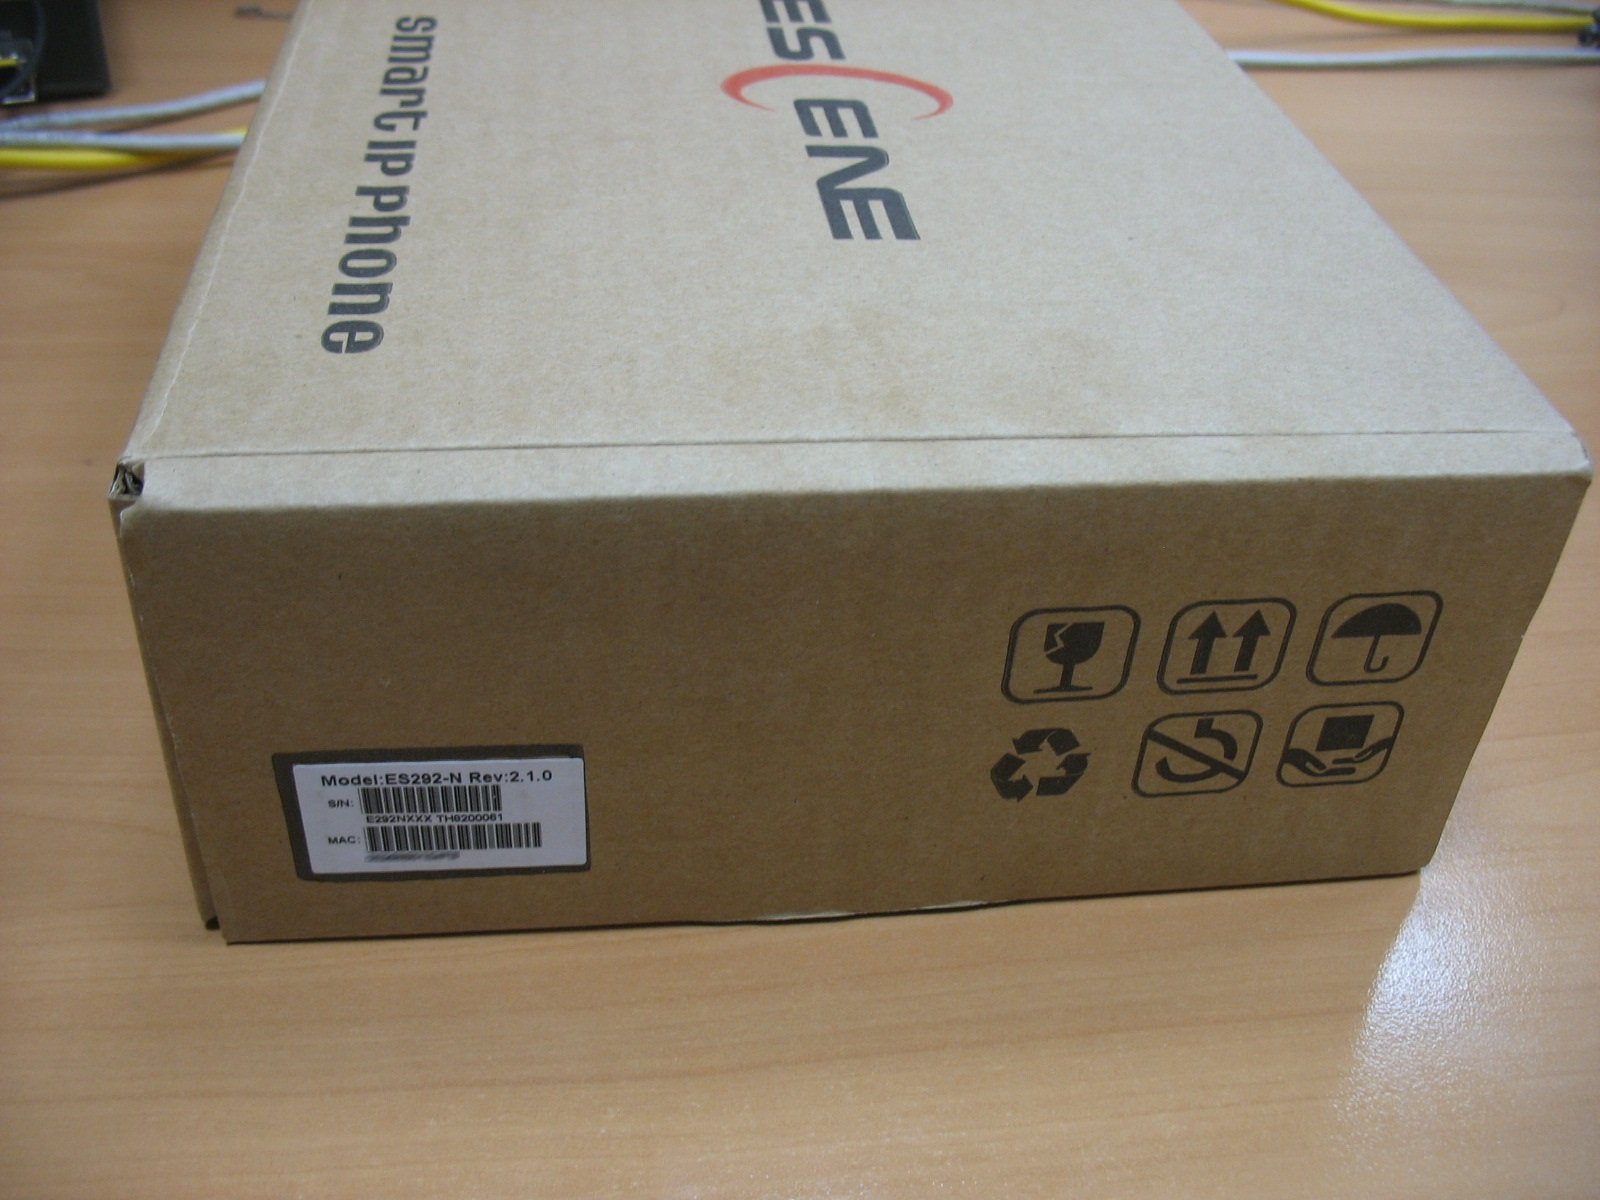 Вид упаковки телефона.